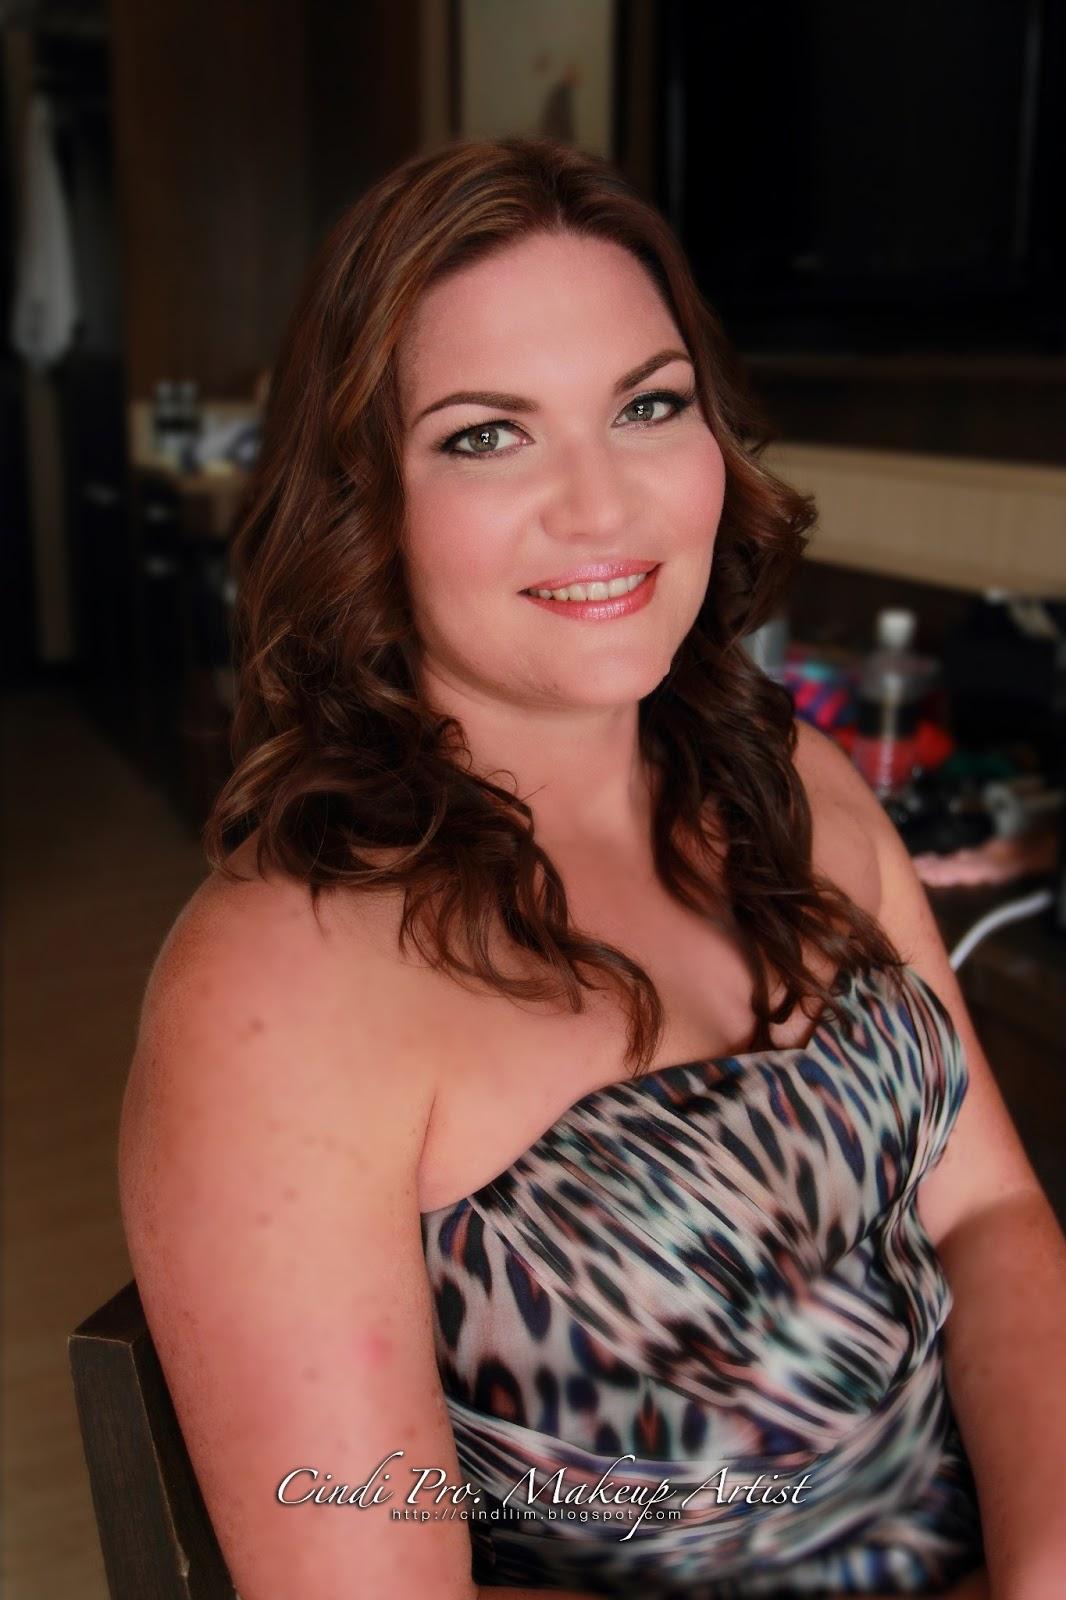 Cindi Pro Makeup Artist Commercial Photoshoot Makeup: :: Cindi Pro. Makeup Artist ::: Merry Xmas To Angela Smith